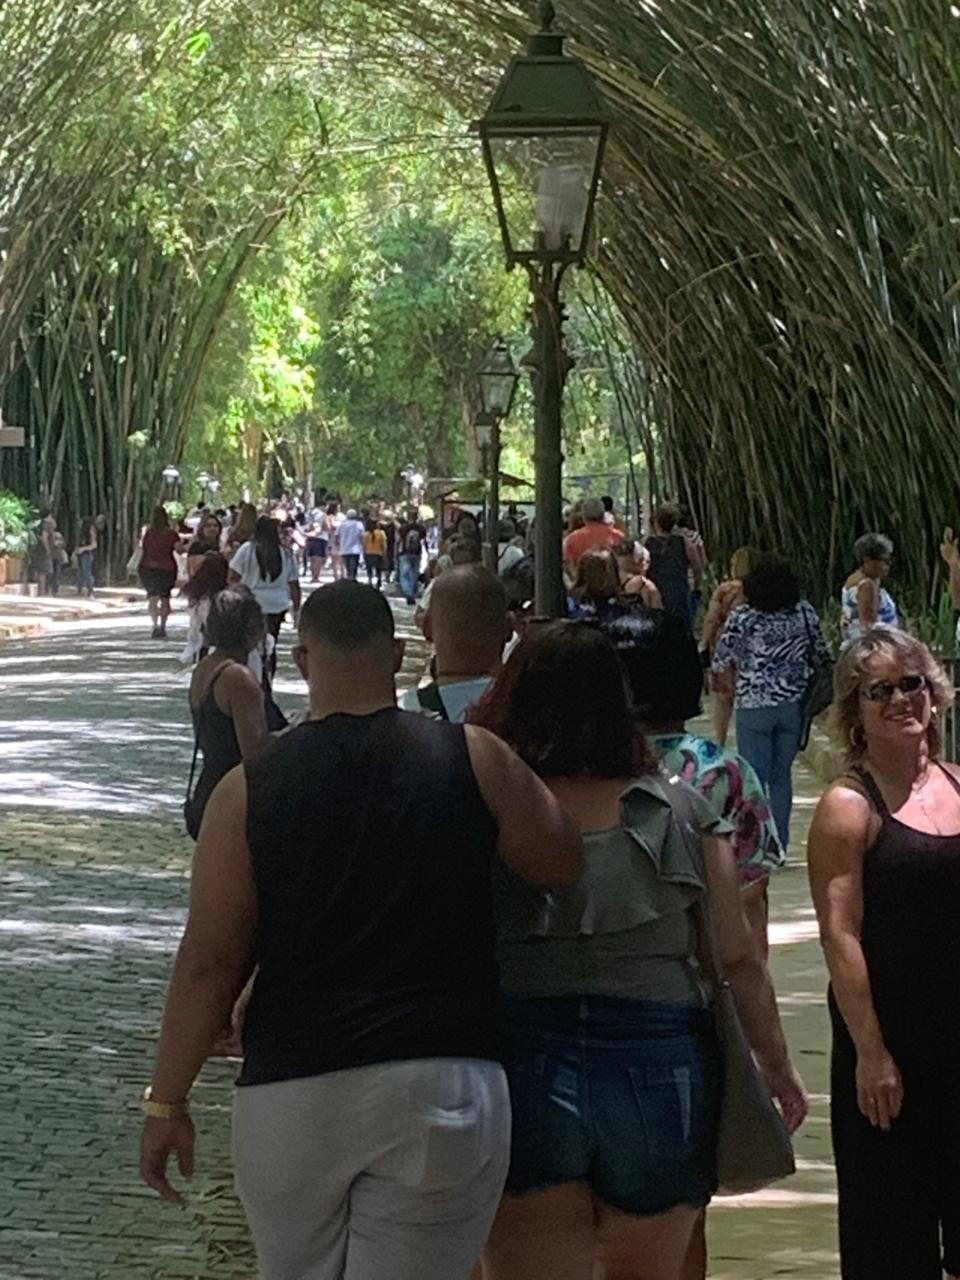 A alameda de bambus do Country lotada de turistas (Fotos de leitores)